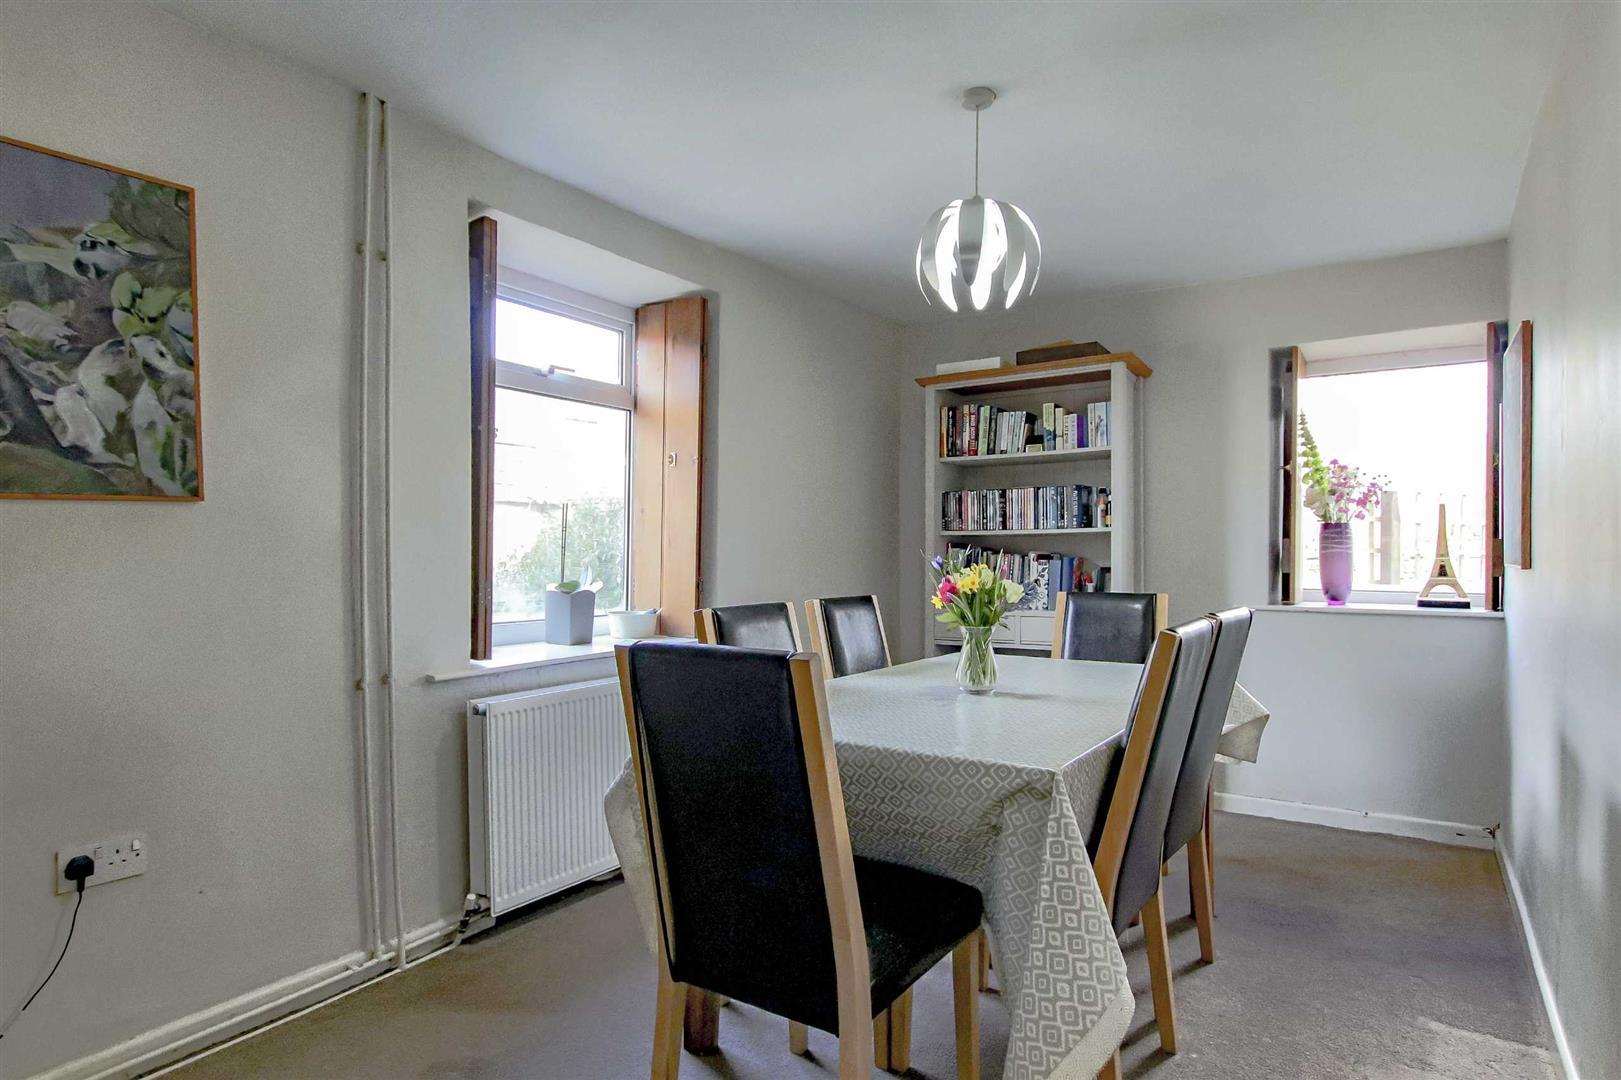 4 Bedroom Detached House For Sale - p033686_38.jpg